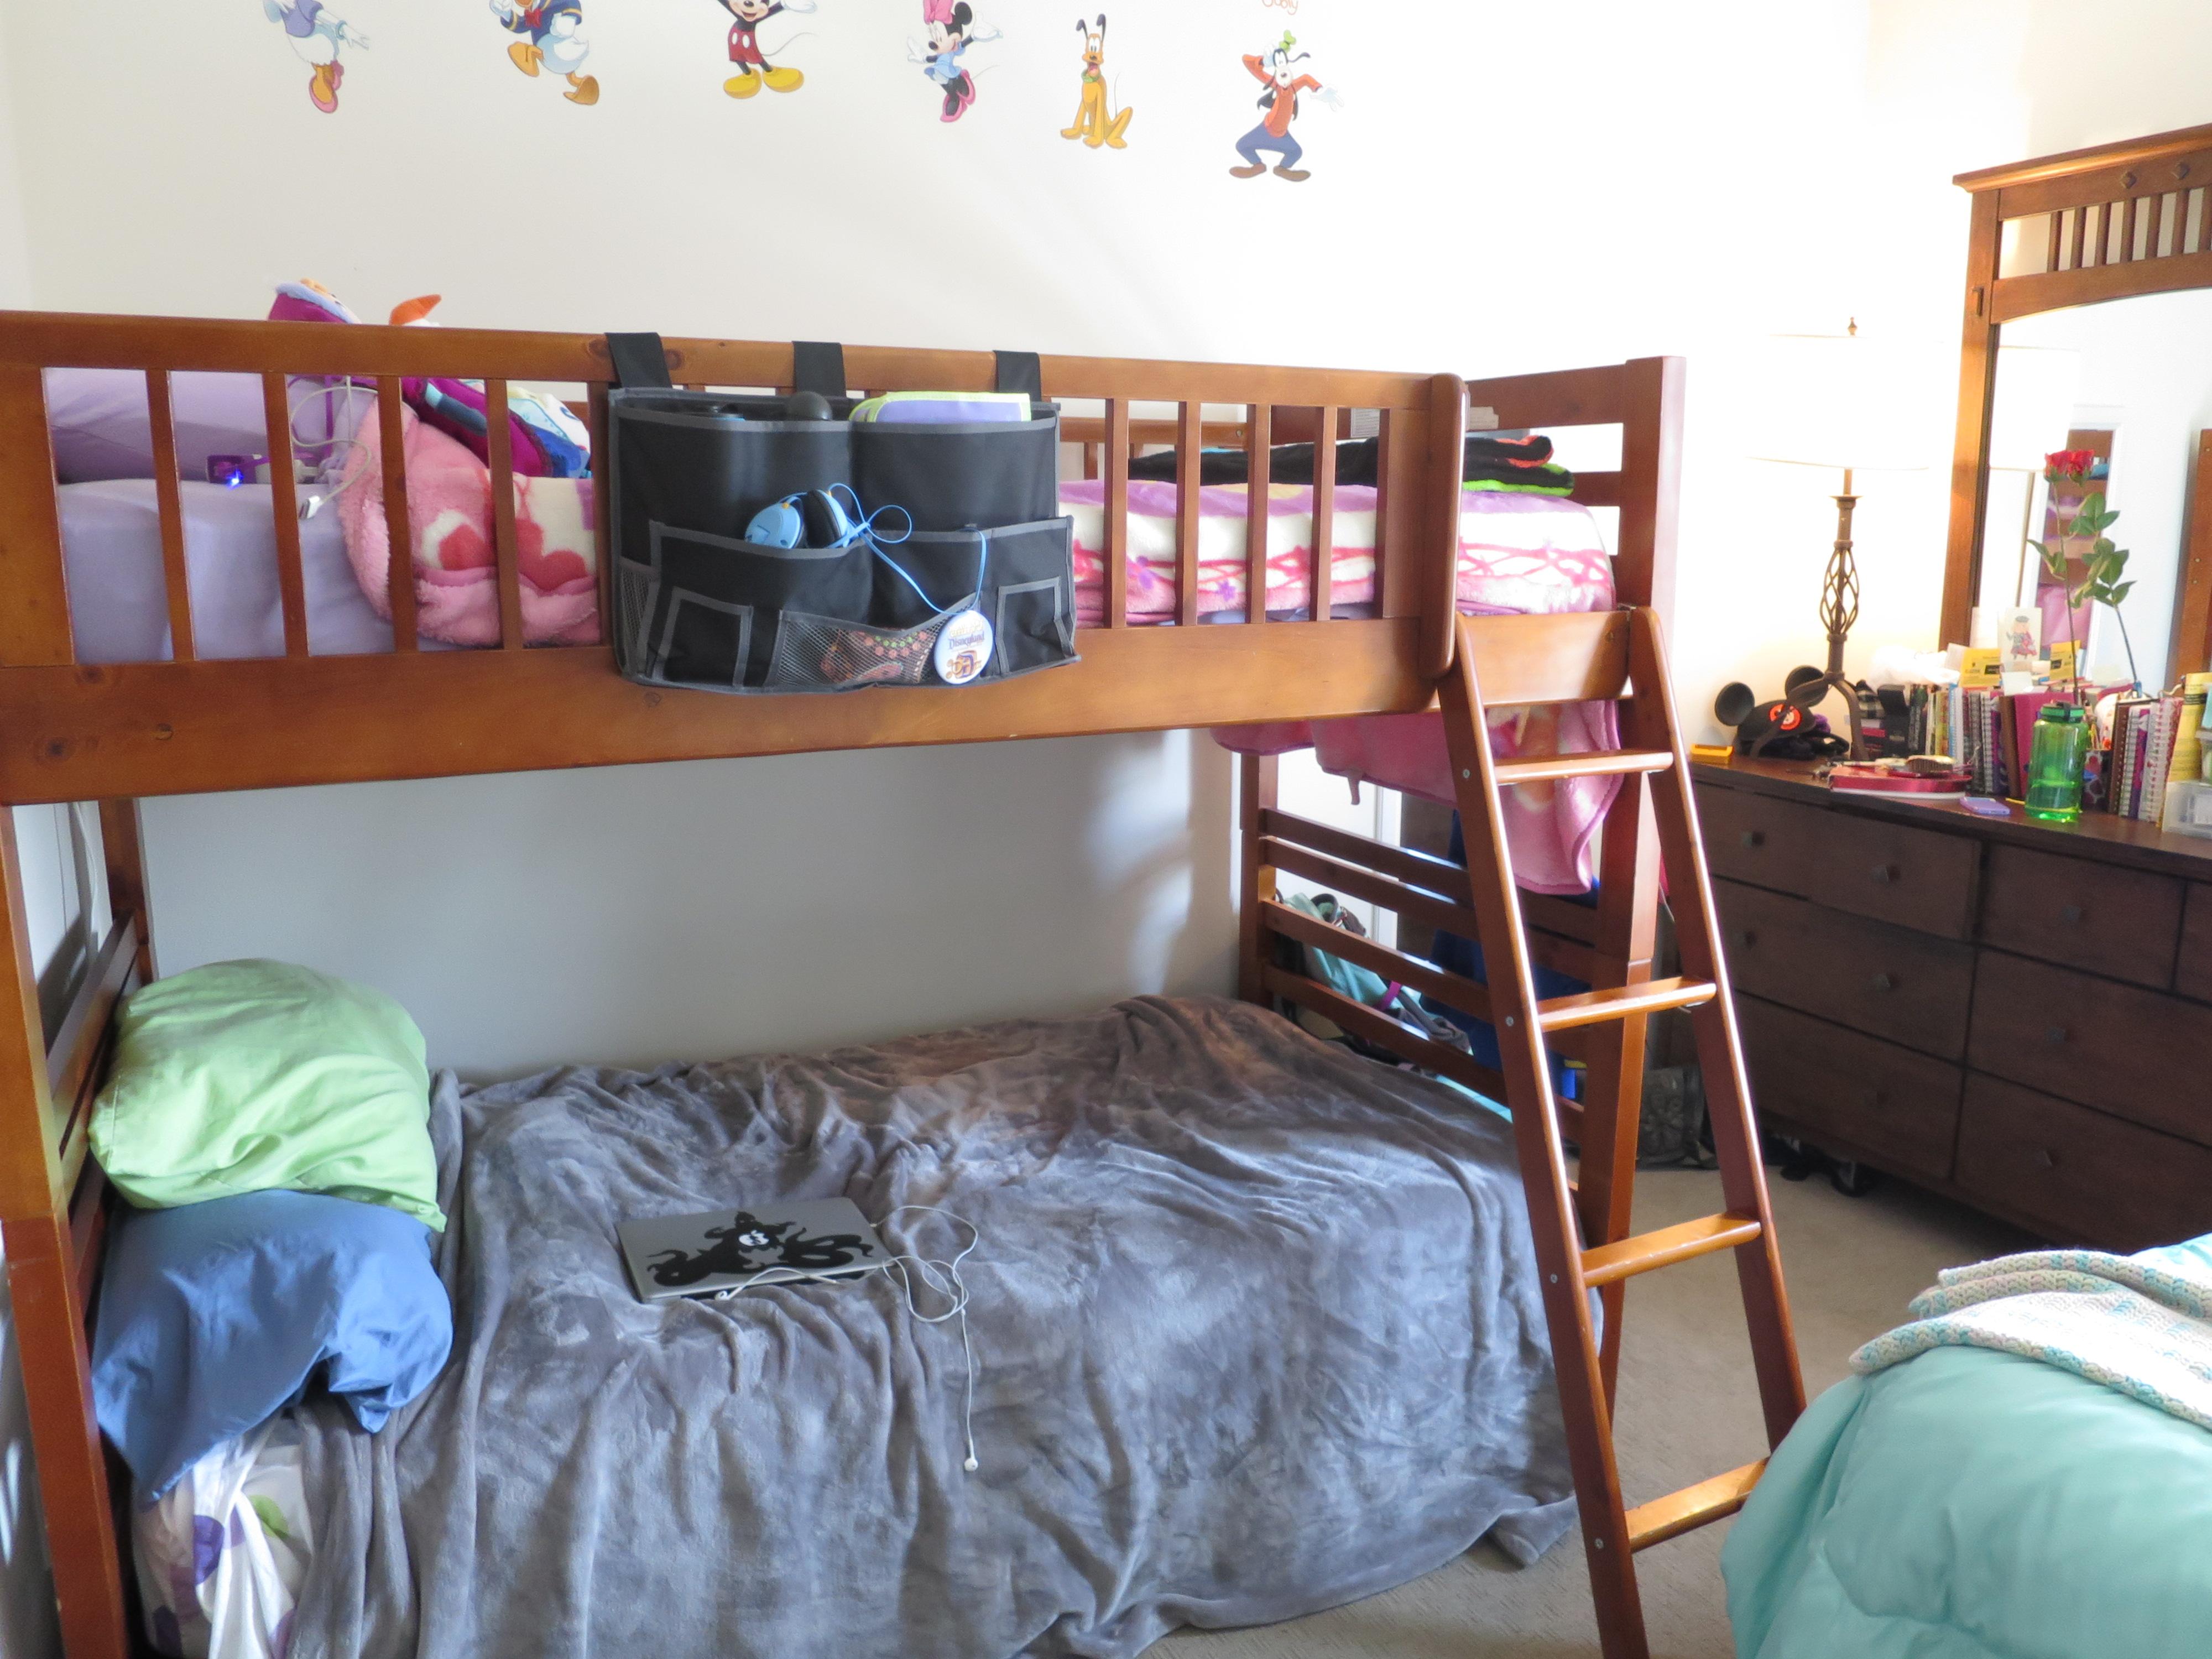 Student Apartment Loft Studio flat loft hoxton Modern apartment